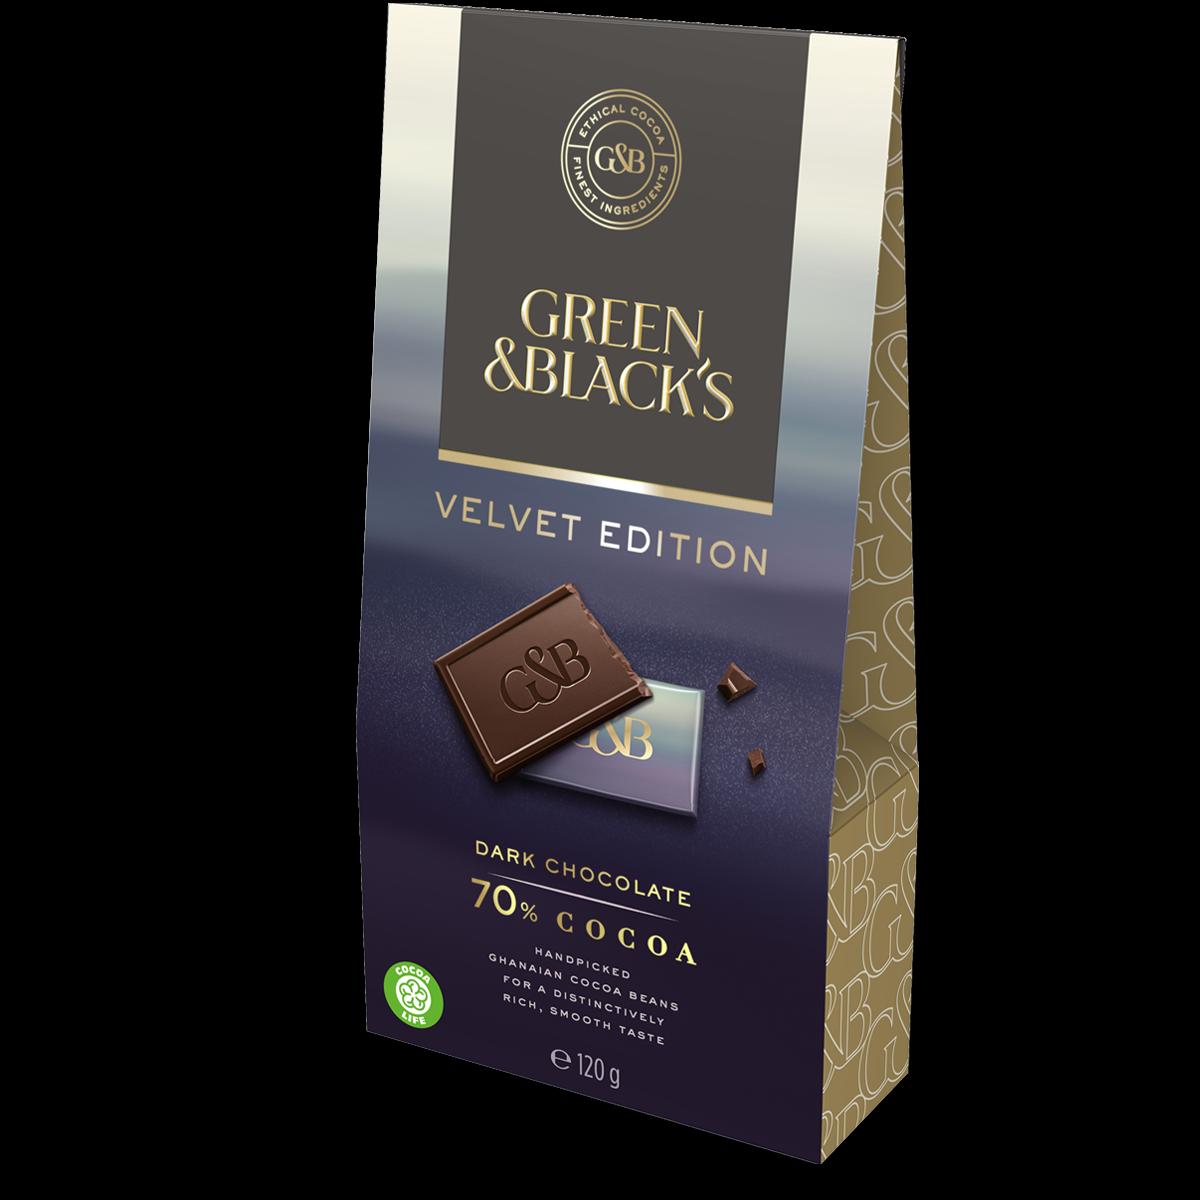 Green & Black's Dark Chocolate 70% Bag 120g (Box of 5)